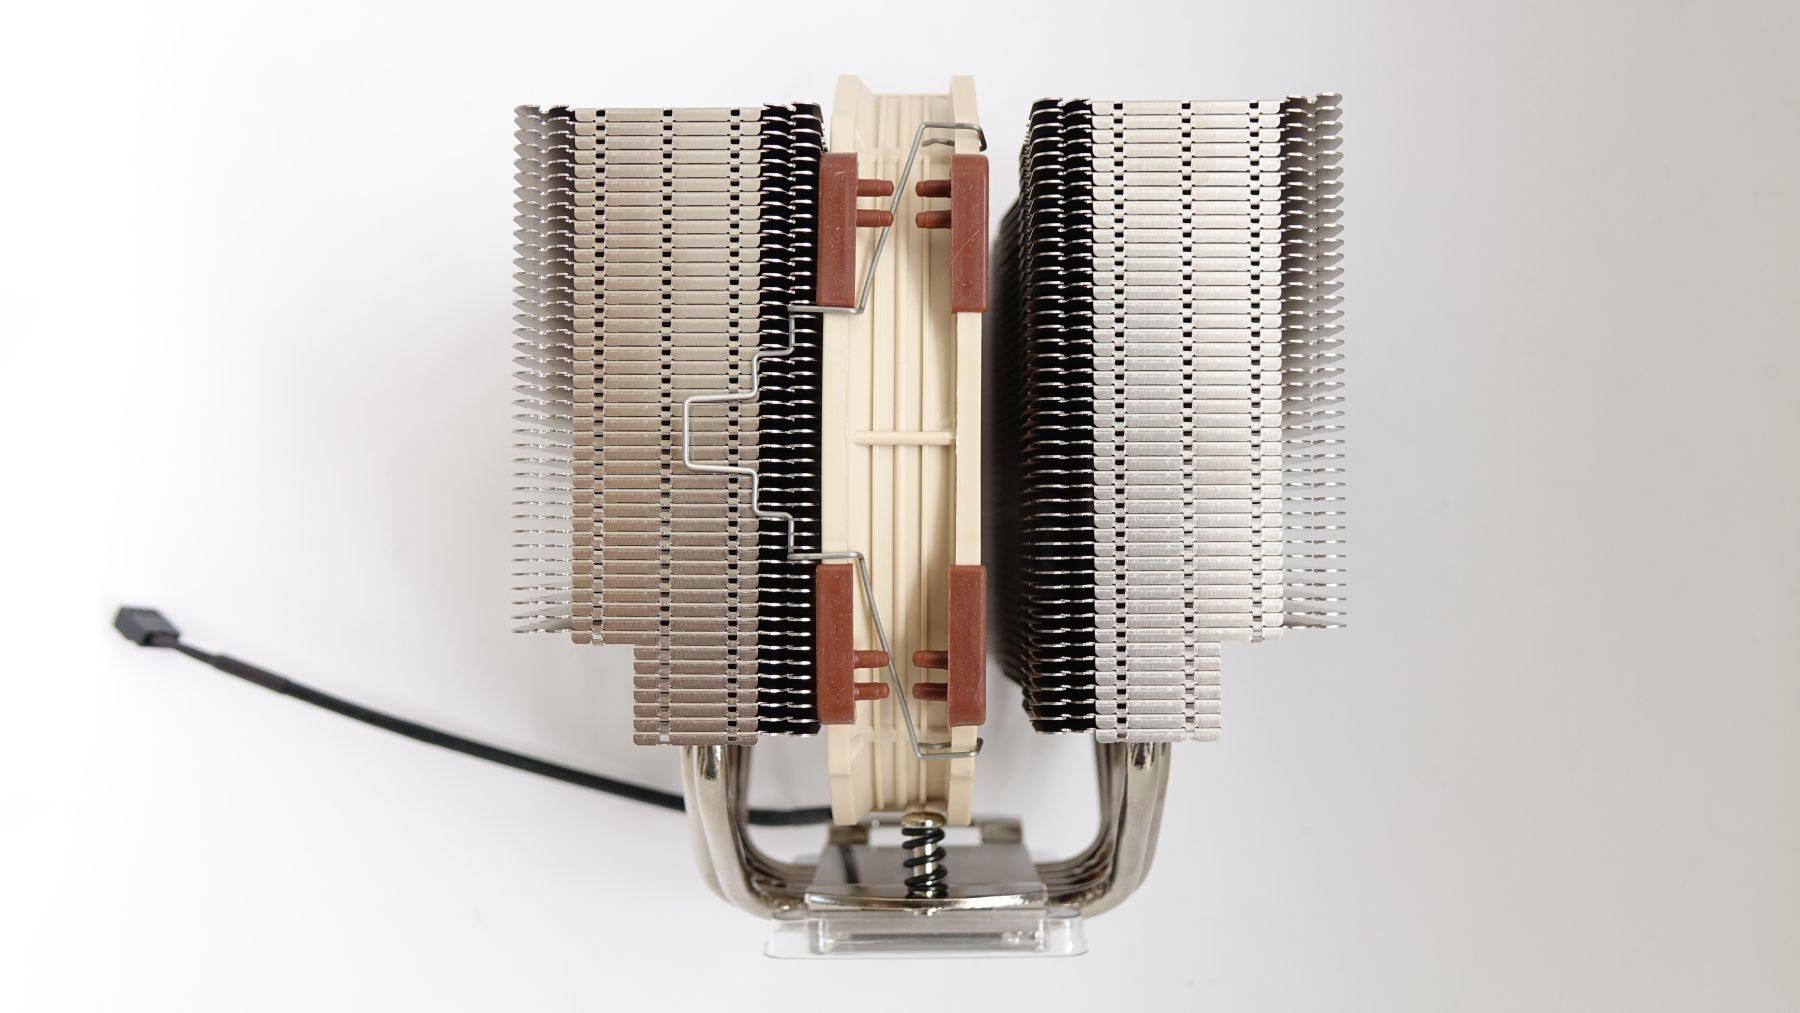 Noctua NH-D15S с одним вентилятором